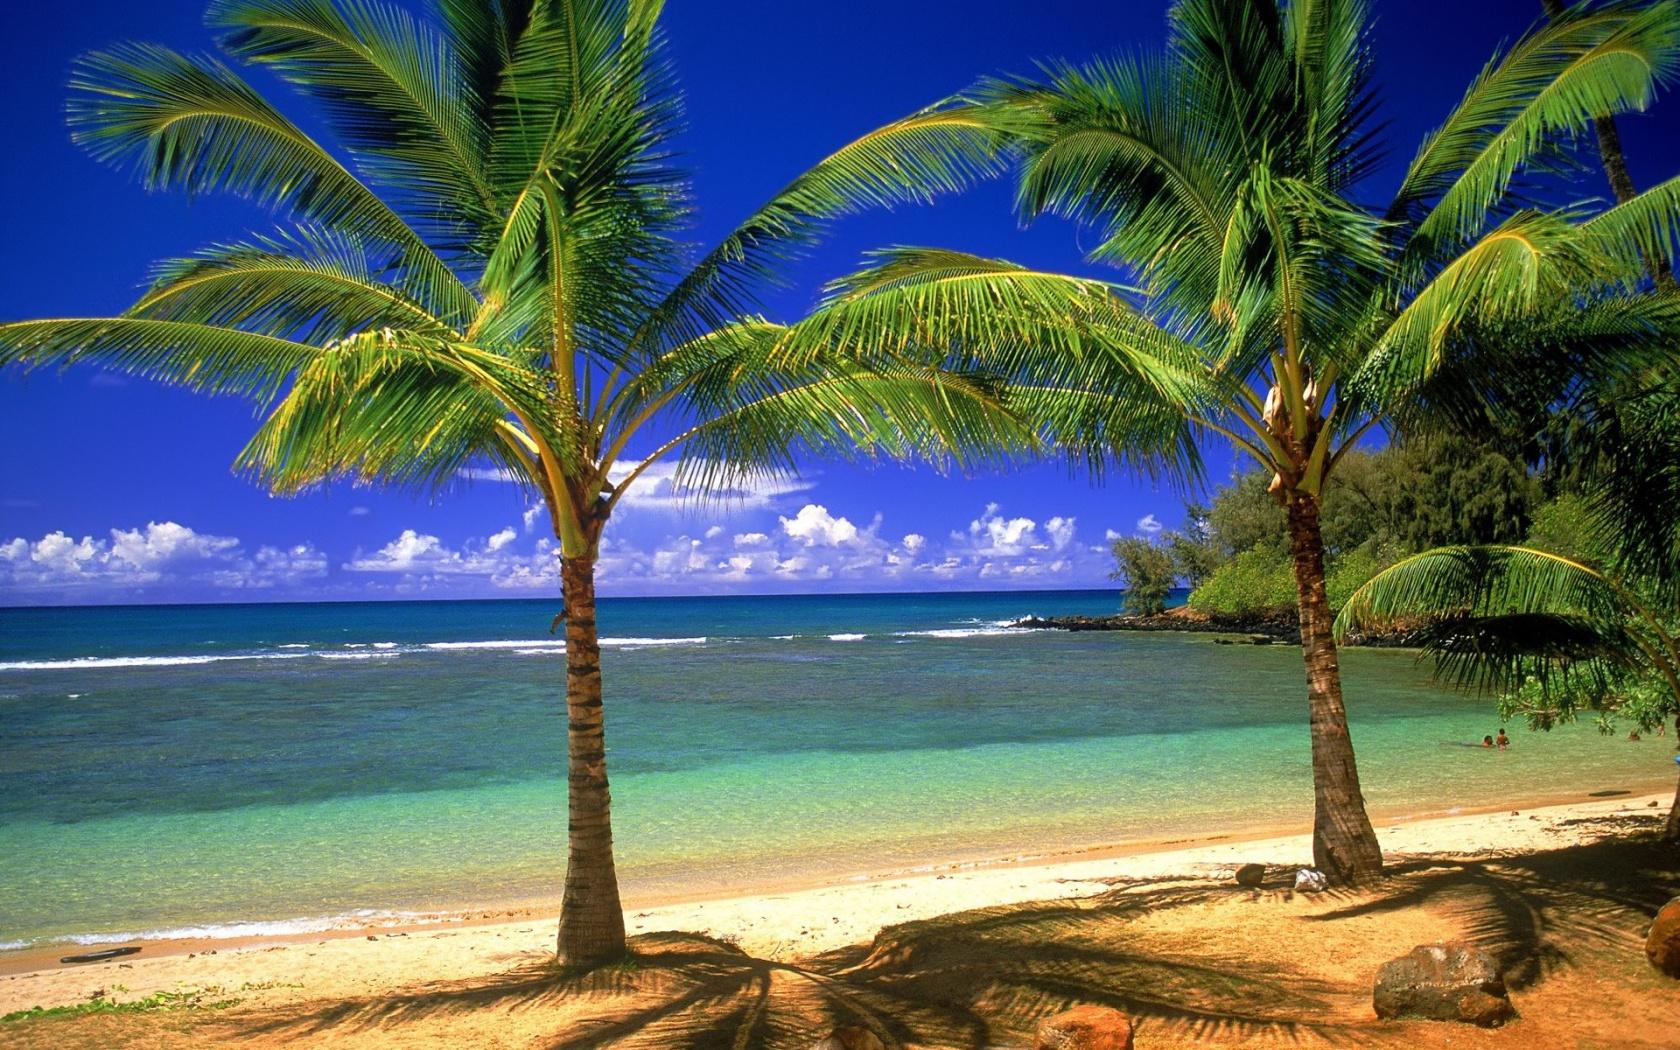 1680x1050 Palms on the beach desktop PC and Mac wallpaper 1680x1050